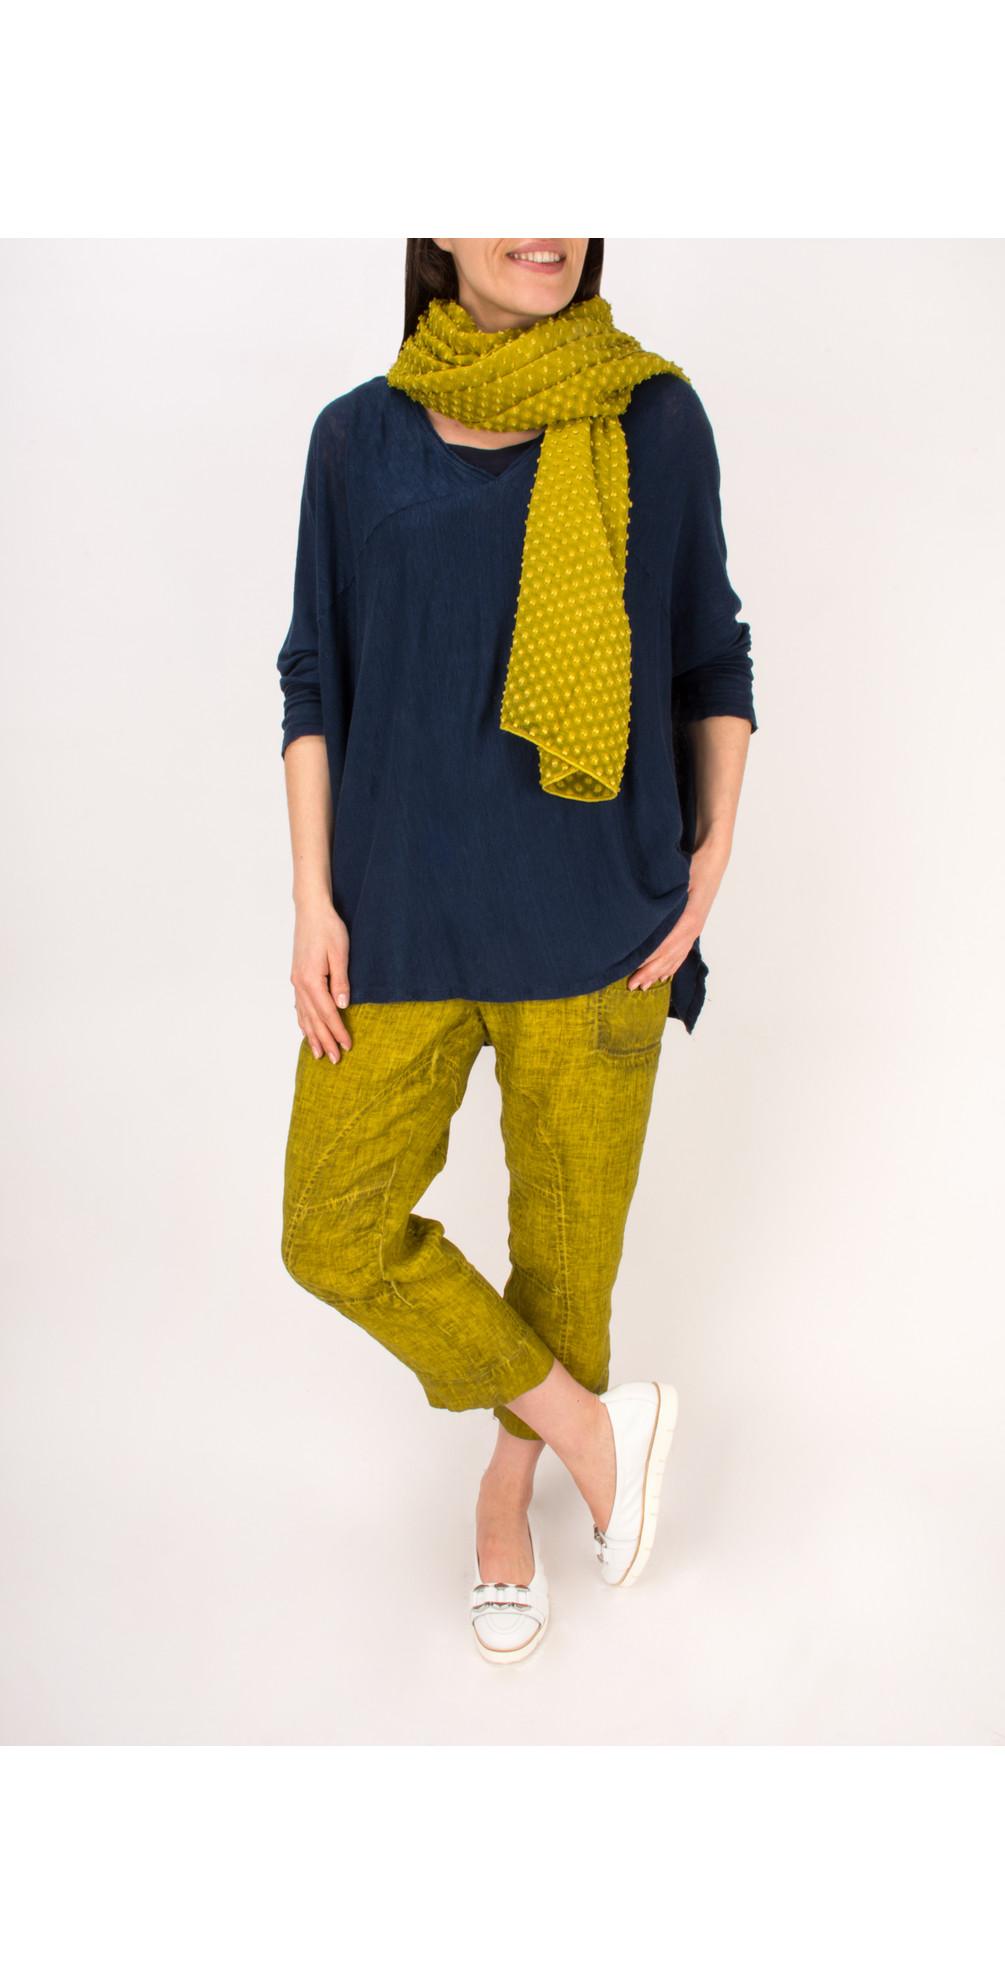 Linen Seam Detail Easyfit 7/8 Trouser main image